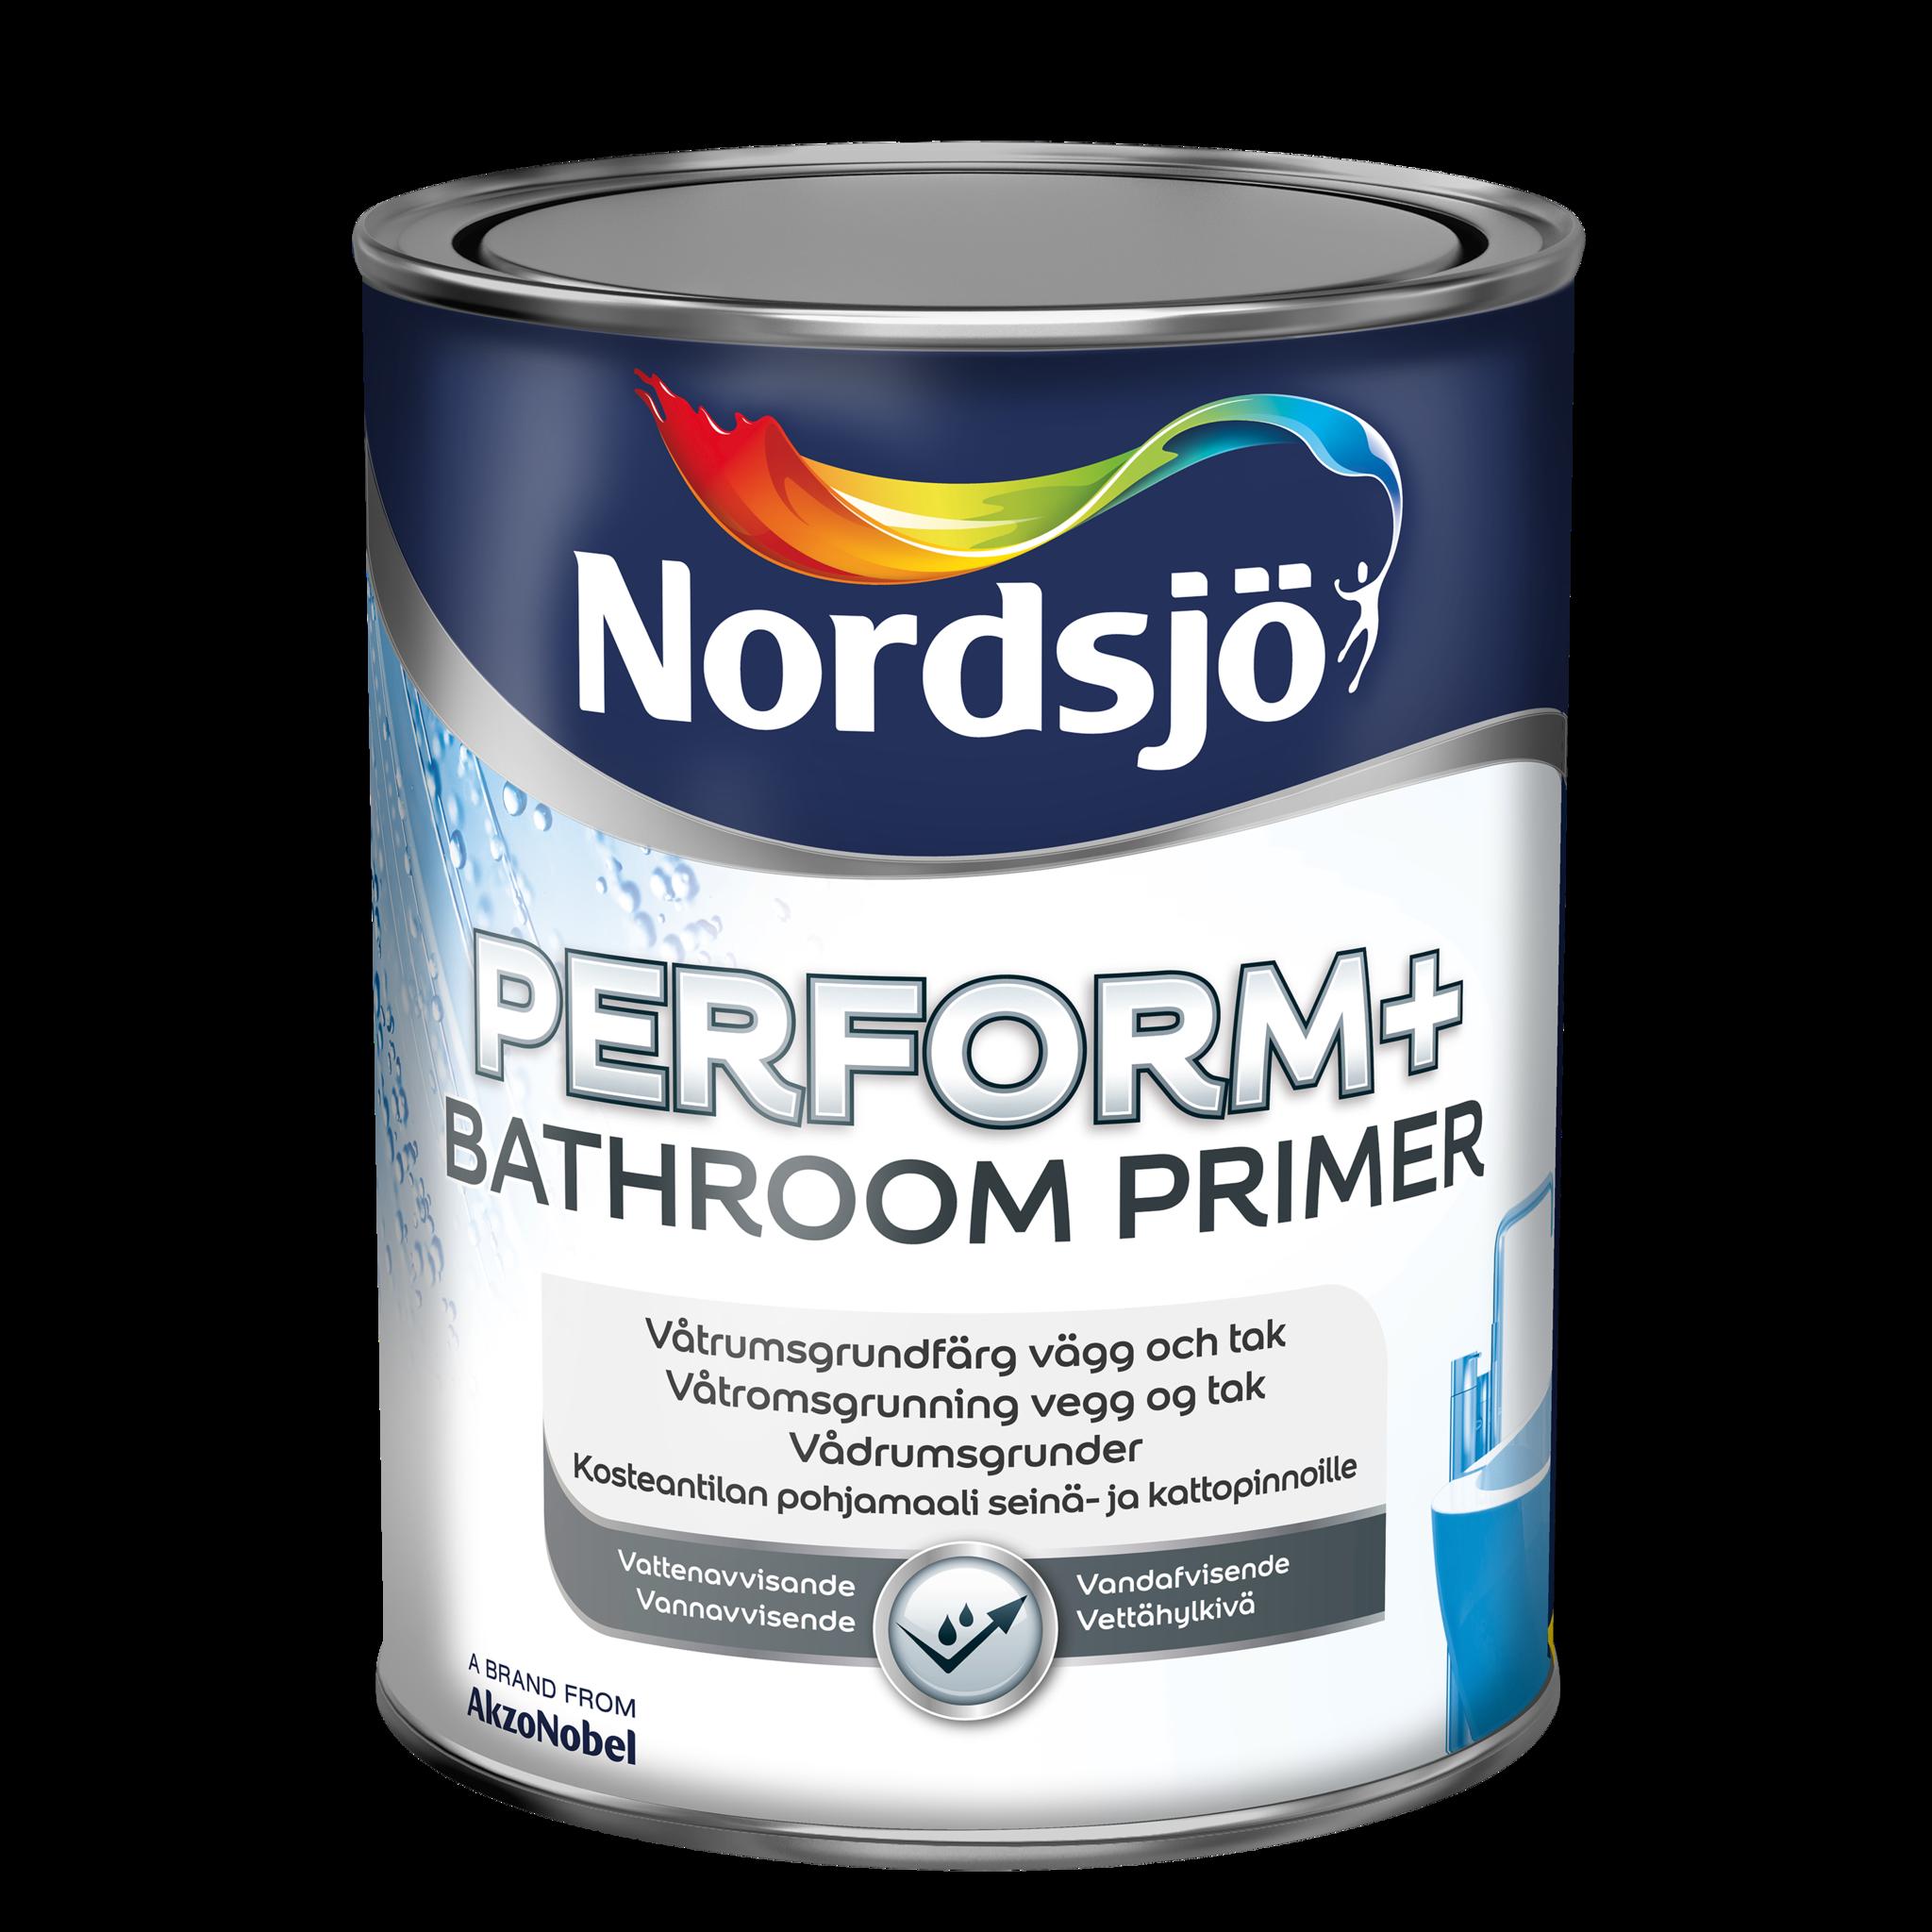 Nordsjö Perform+ Bathroom Primer